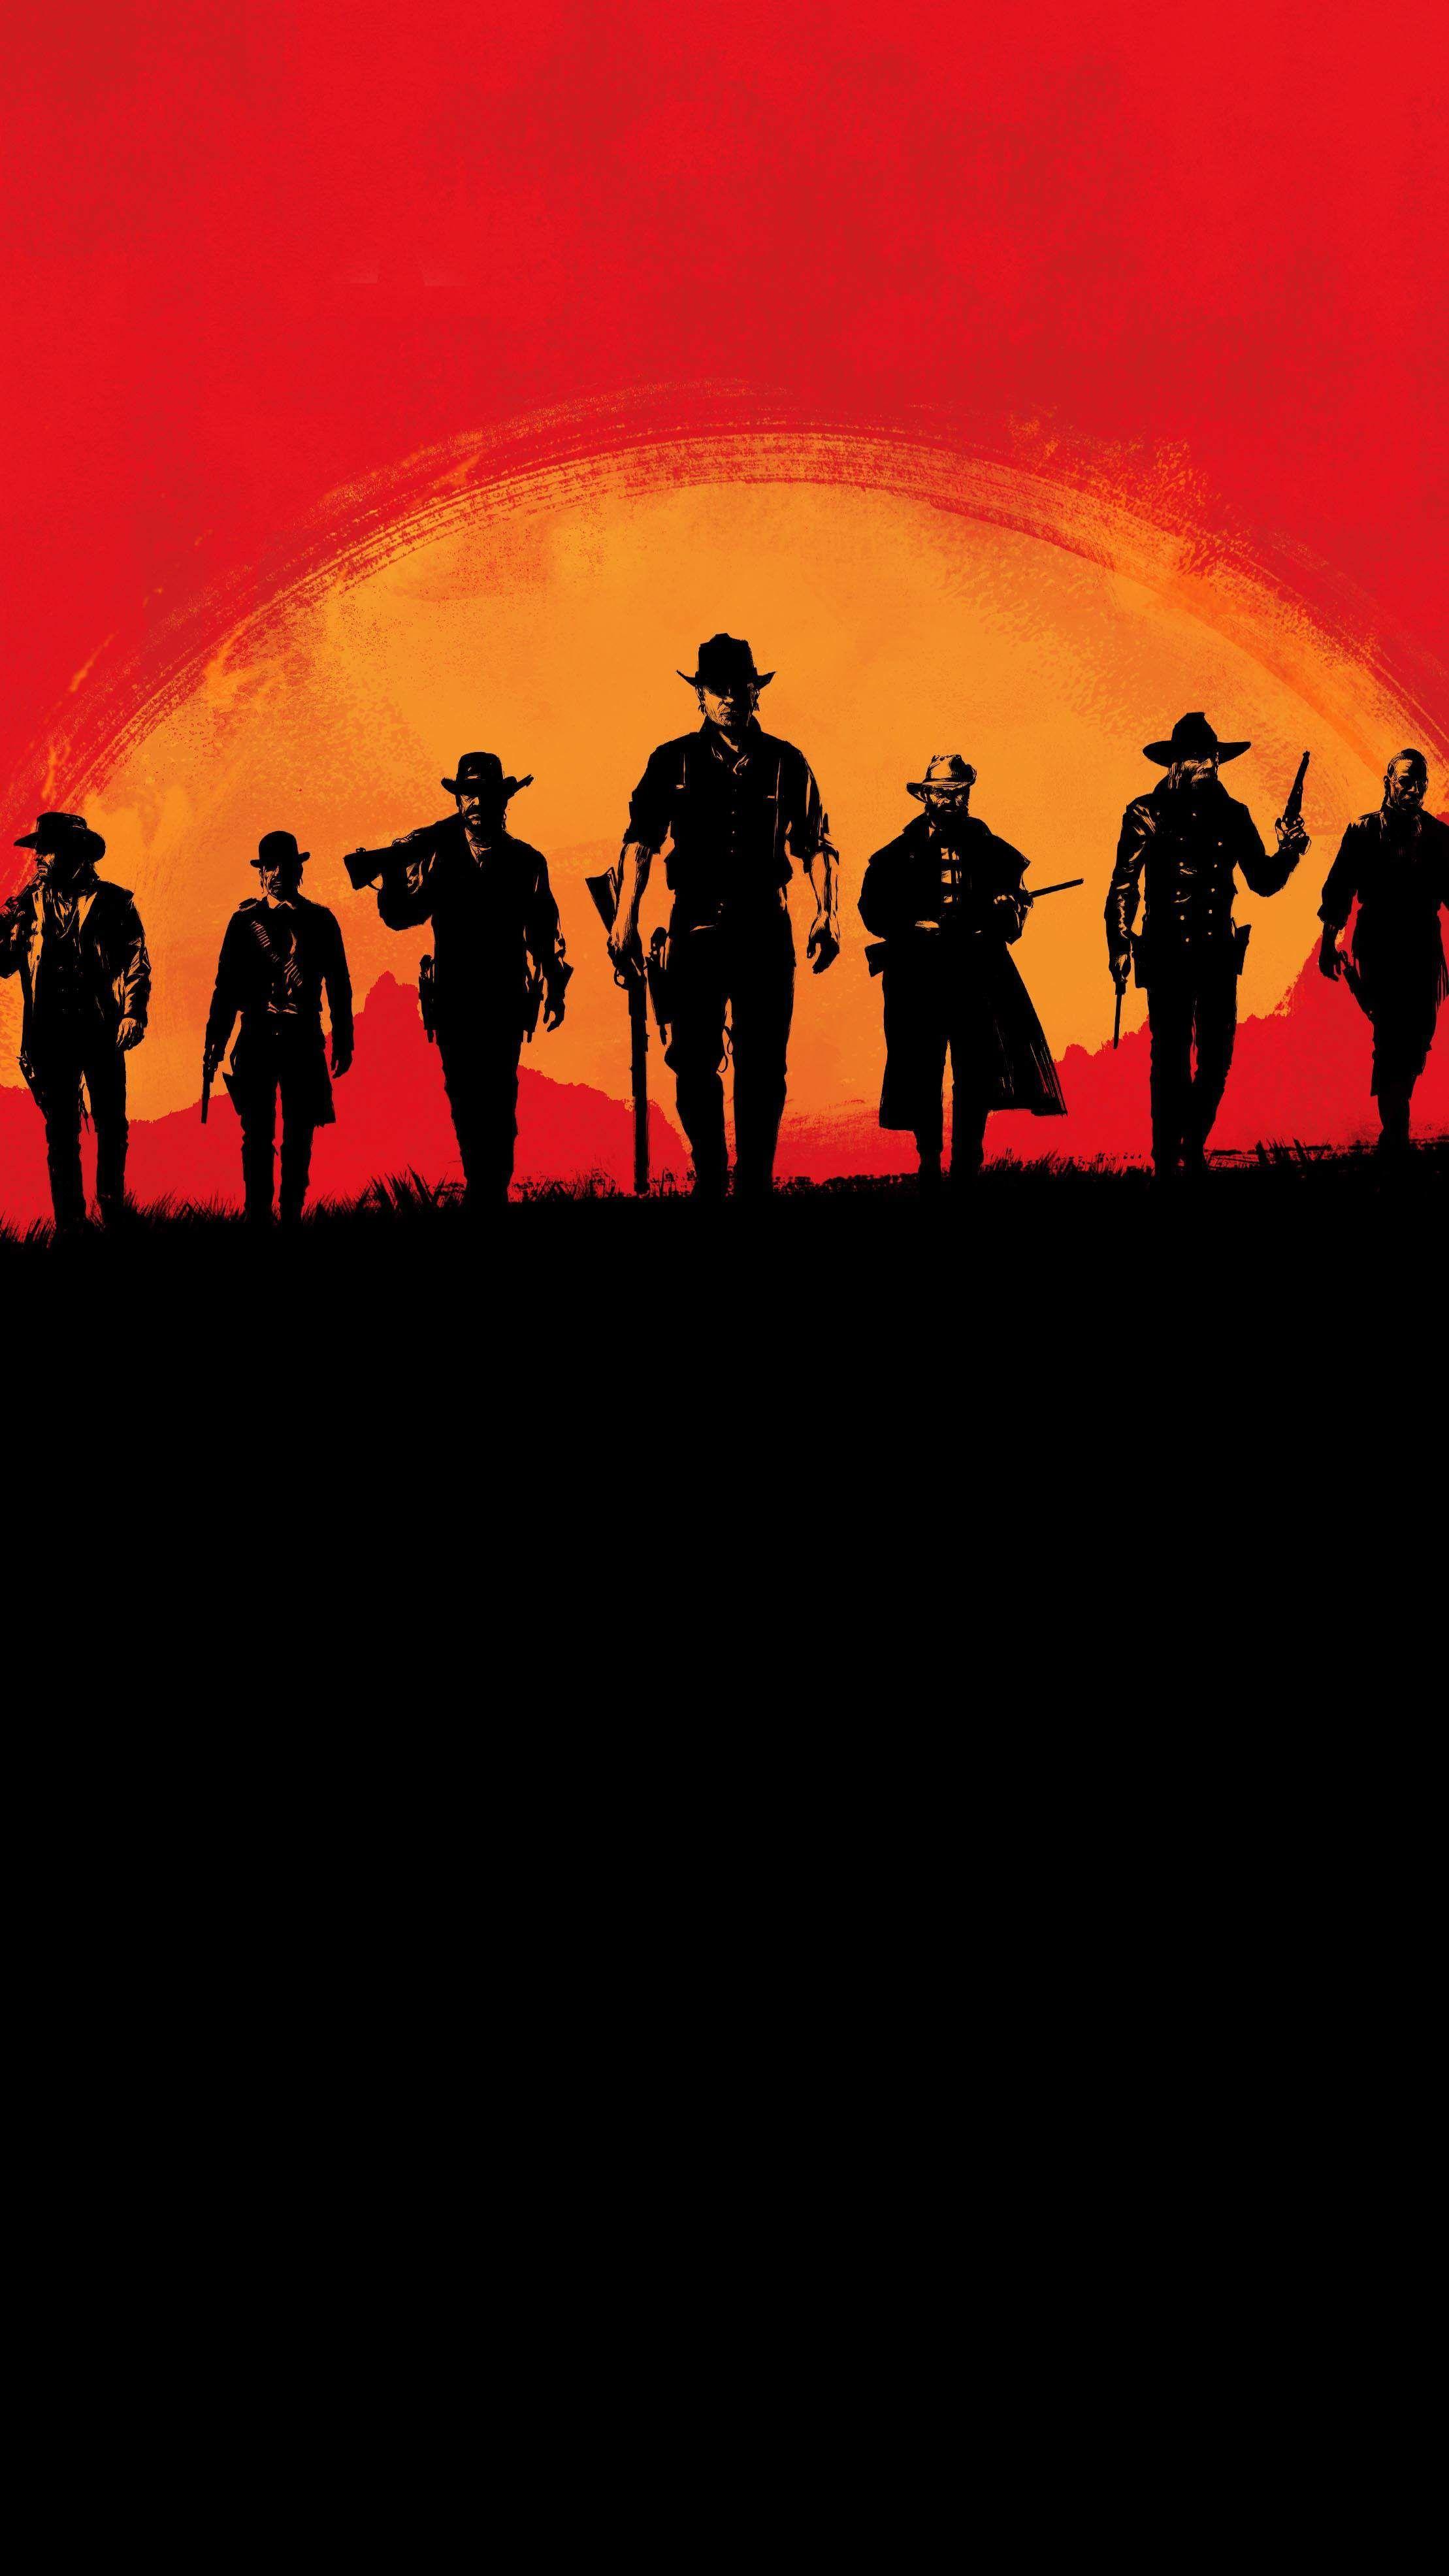 Red Dead Redemption 2 Iphone Wallpaper Video Games Red Dead Kizilderili Tarihi Kurgu Karakterler Oyun Dunyasi